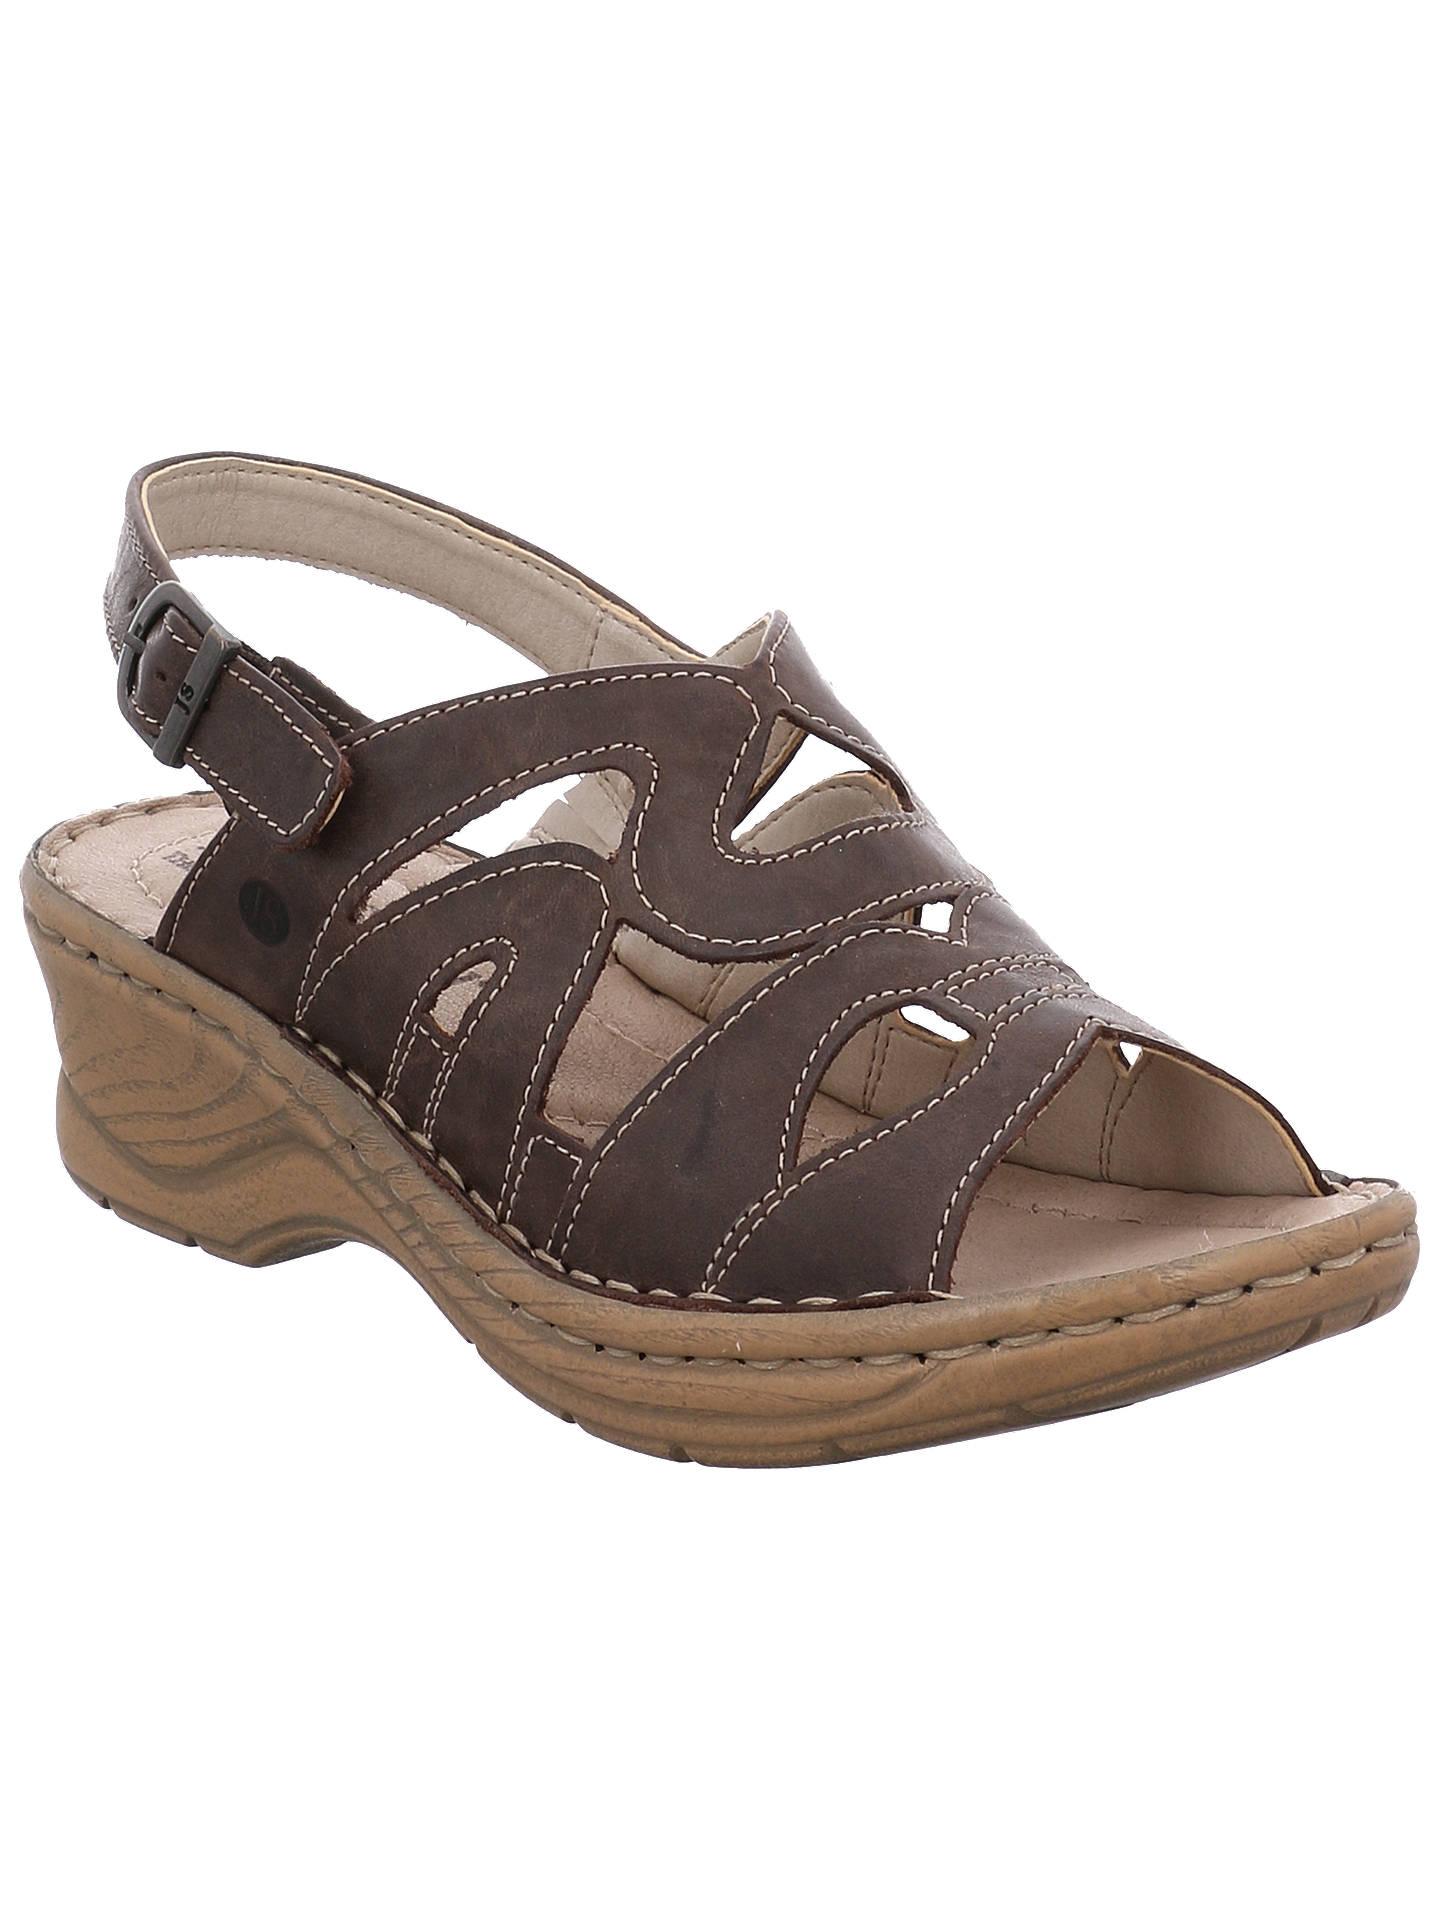 d6c30d8b1f2 Buy Josef Seibel Catalonia 46 Slingback Sandals